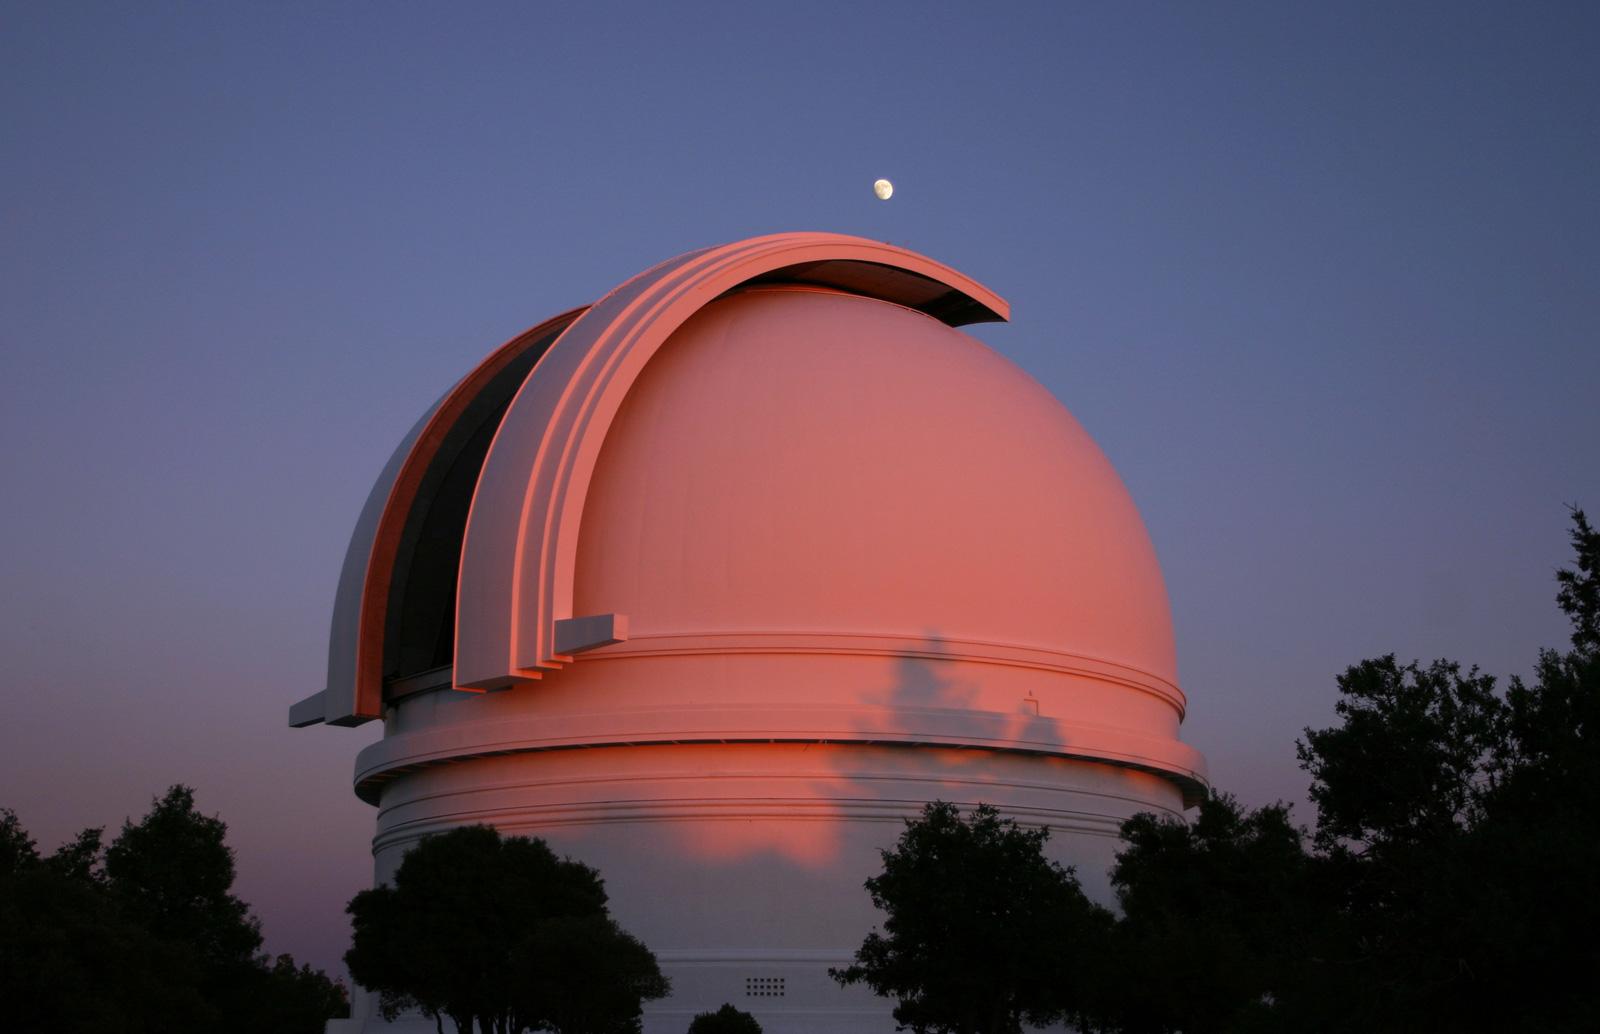 The Palomar 200 inch (5.1 meter) Telescope